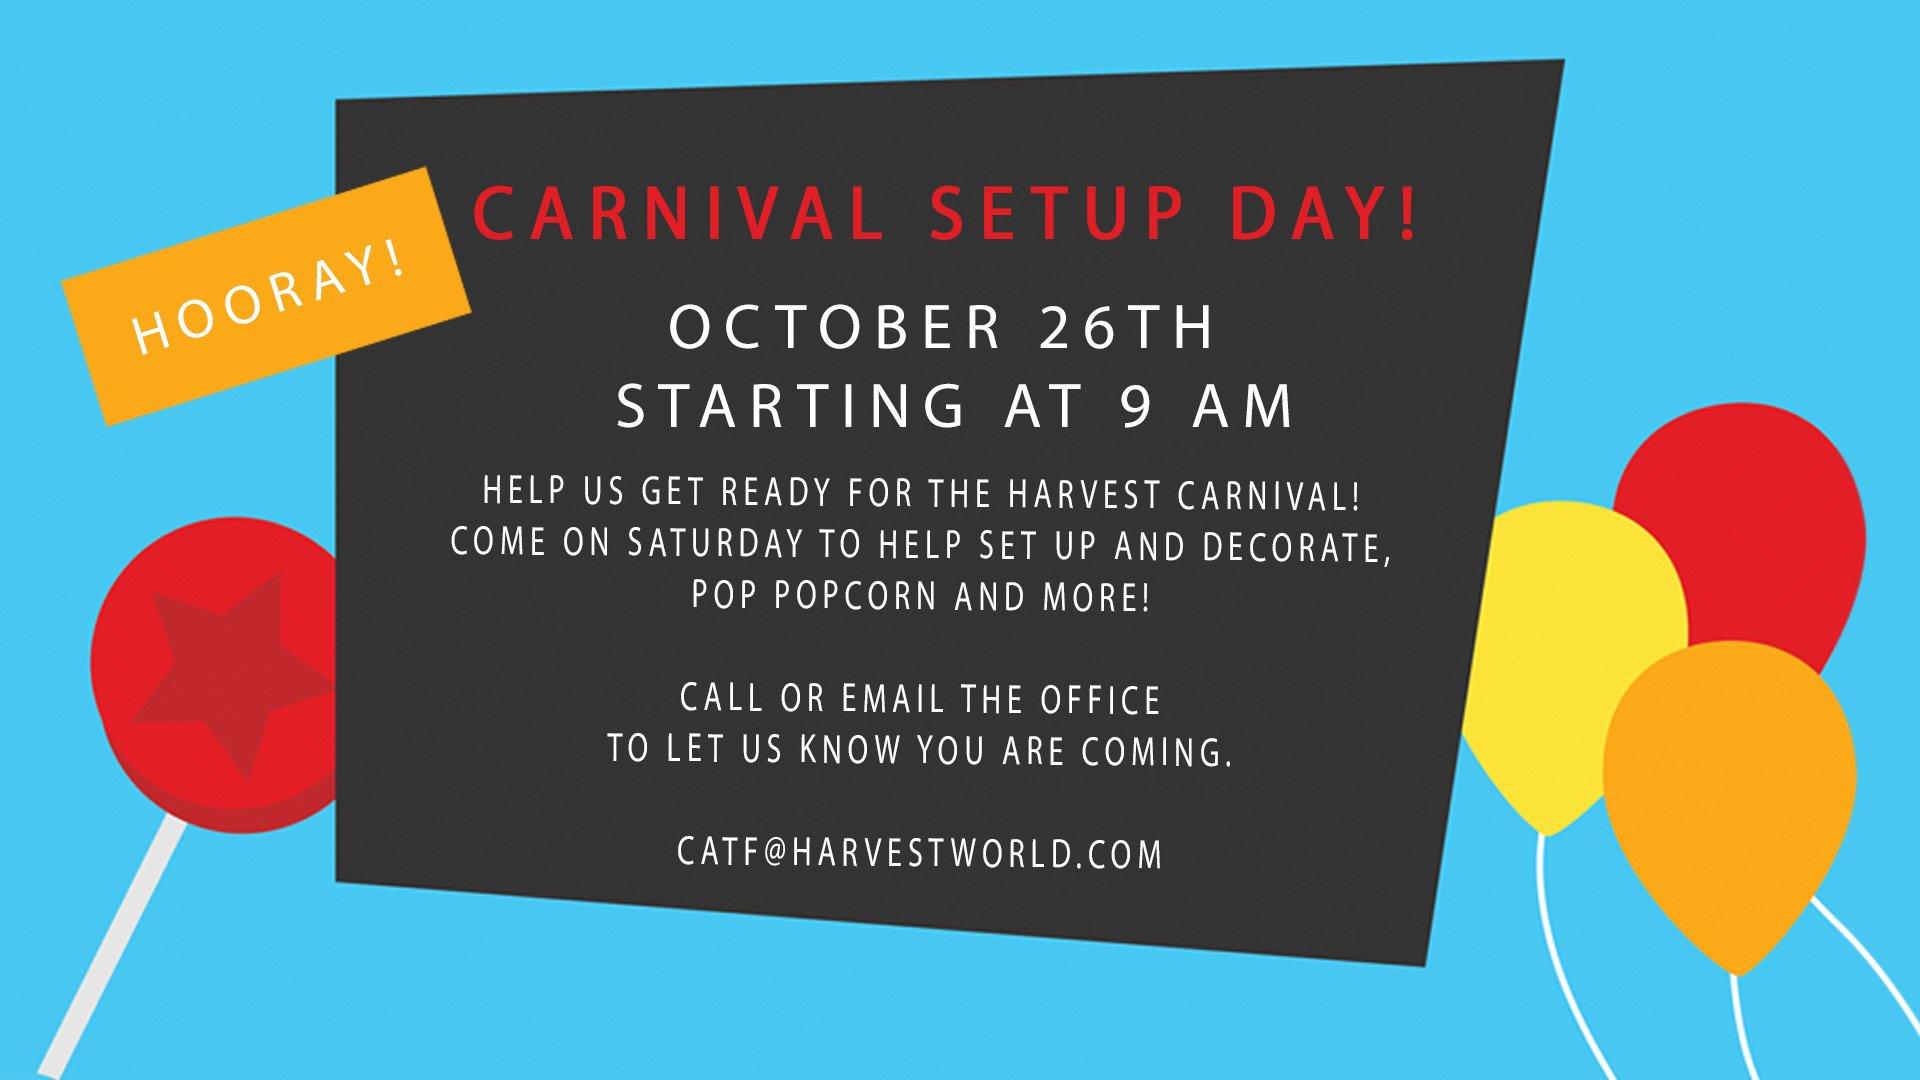 Carnival Setup Day!